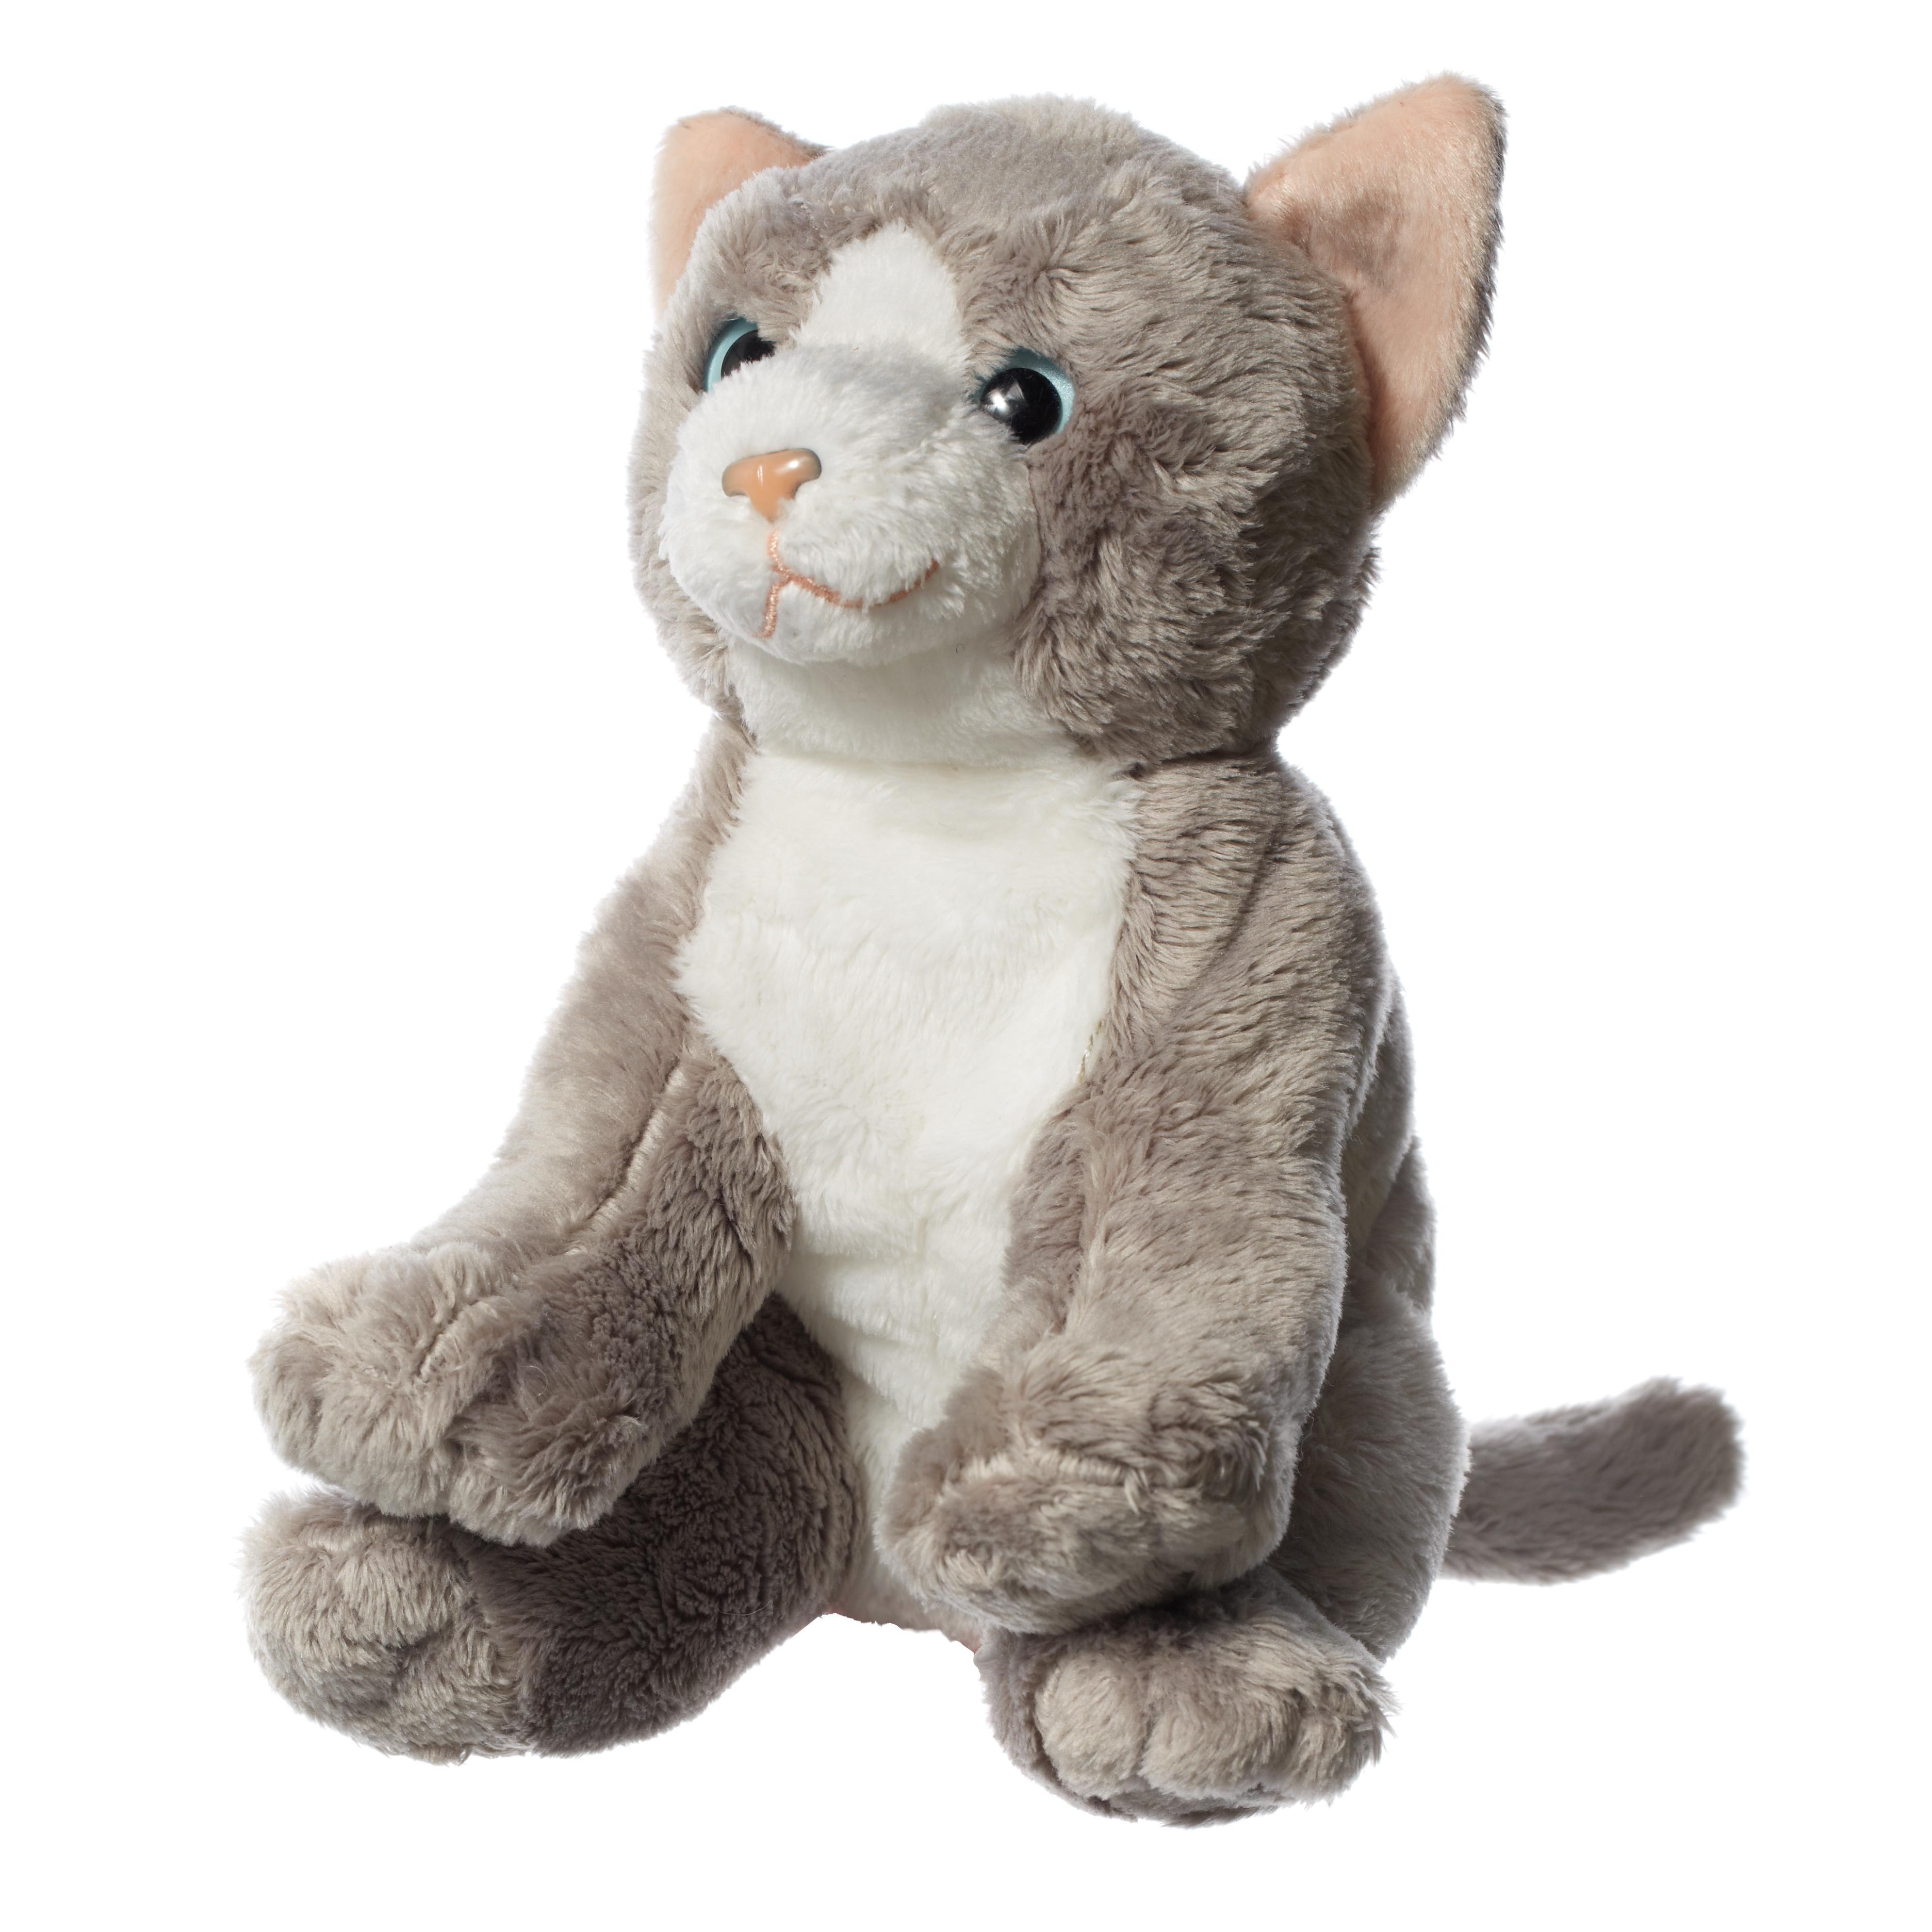 Hamleys 6-Inch Grey & White Cat Soft Toy - £9.00 - Hamleys for Toys ...